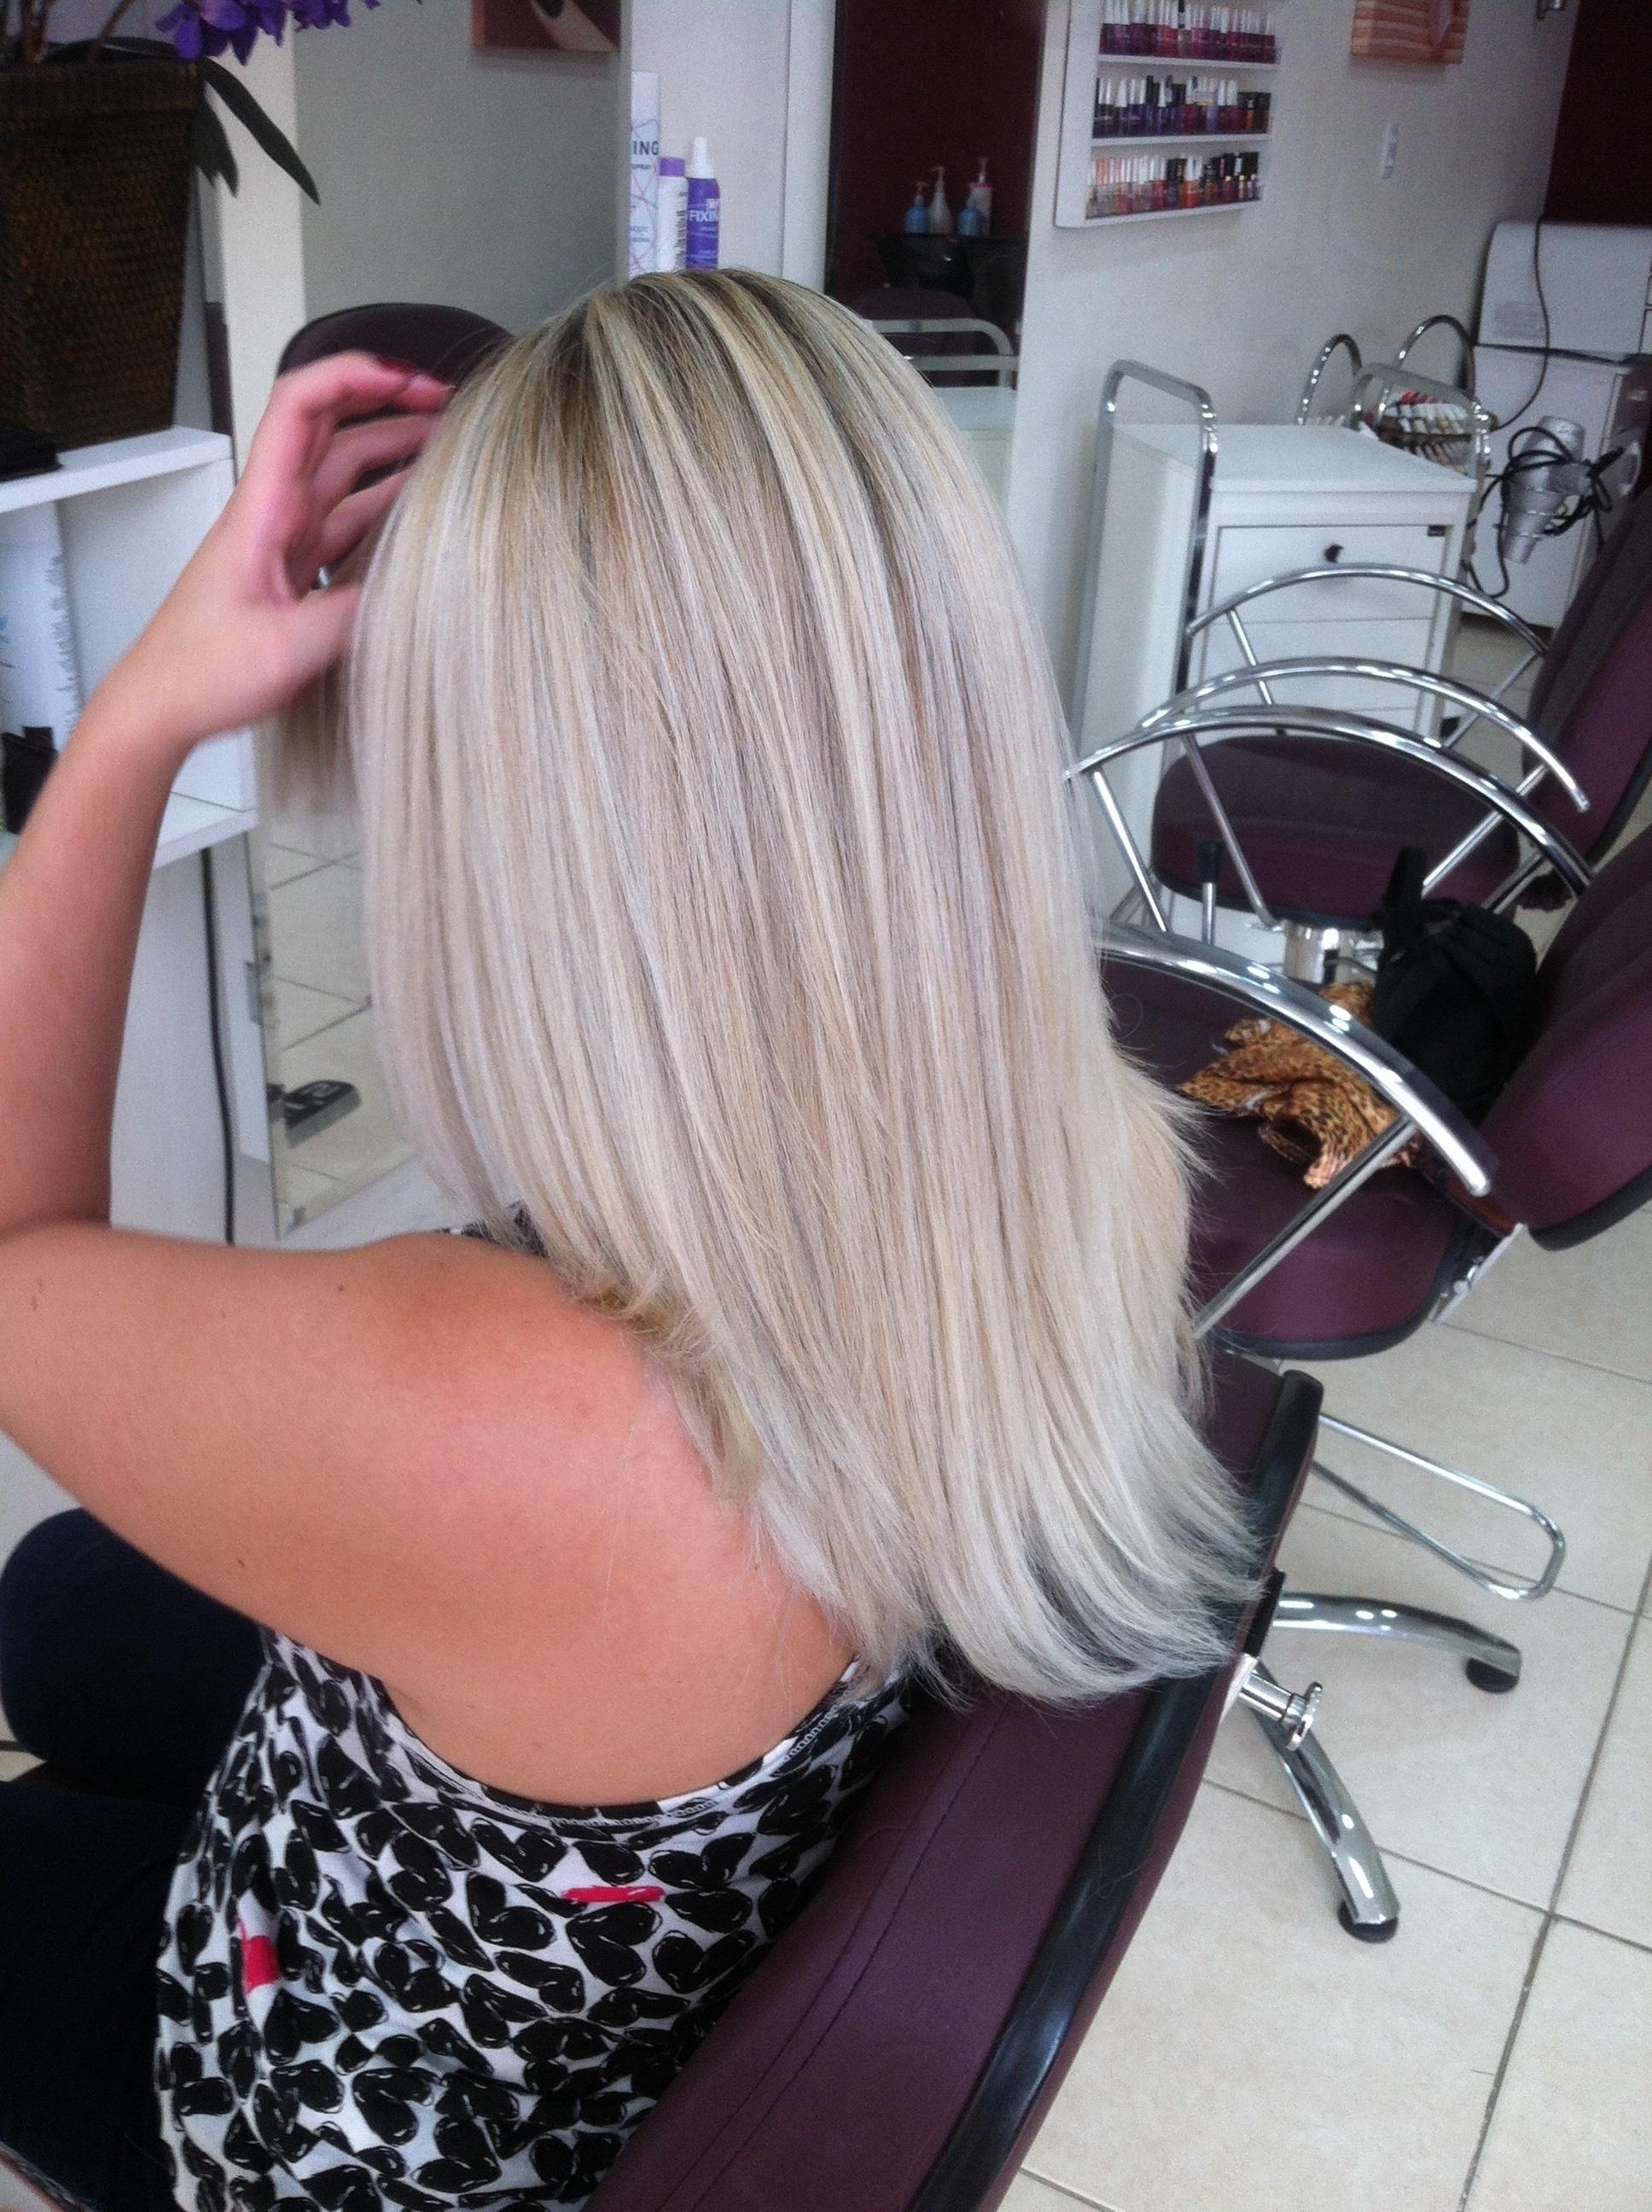 #megablond #ice #baphonicooo cabelo stylist / visagista